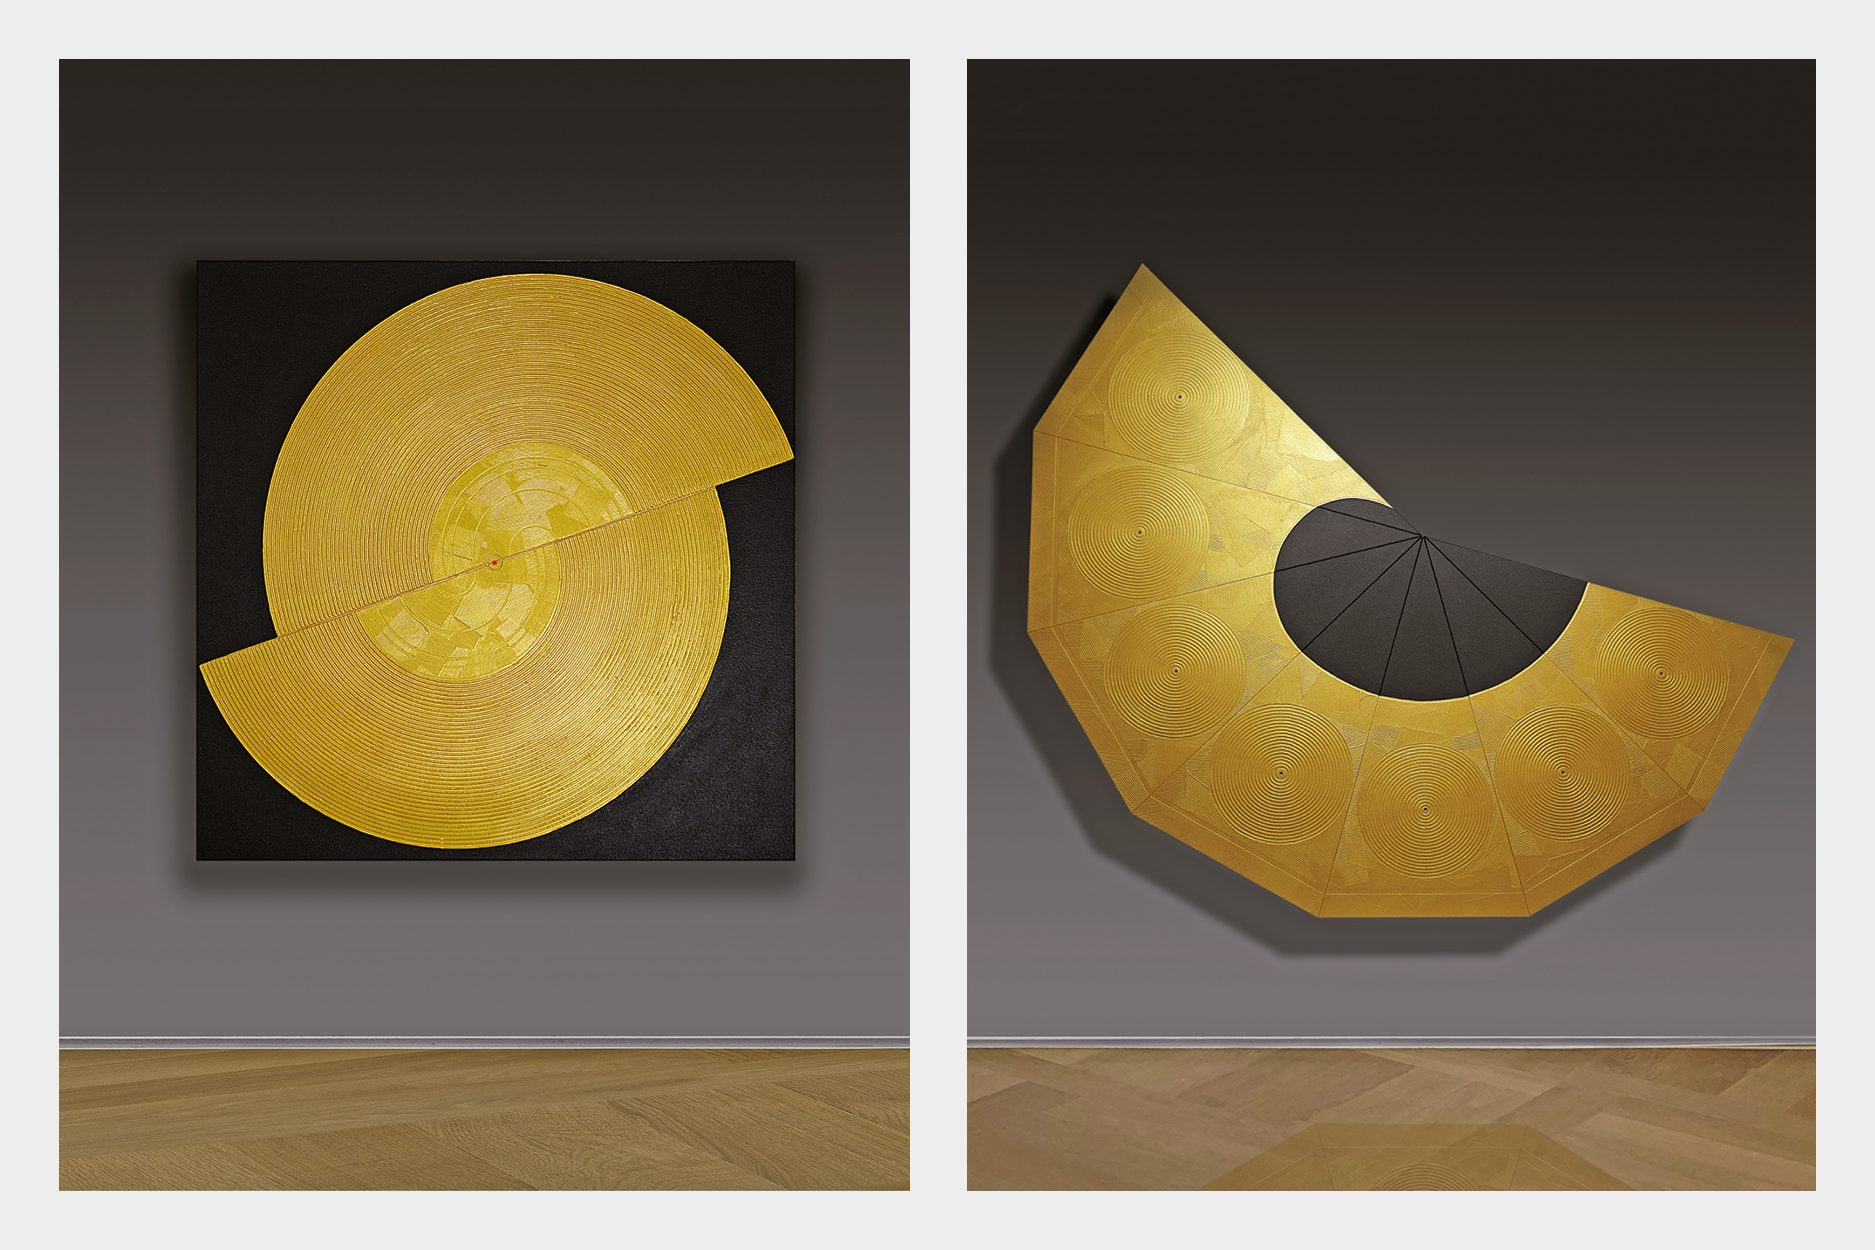 EXHIBITION Gianfranco Zappettini: The Golden Age